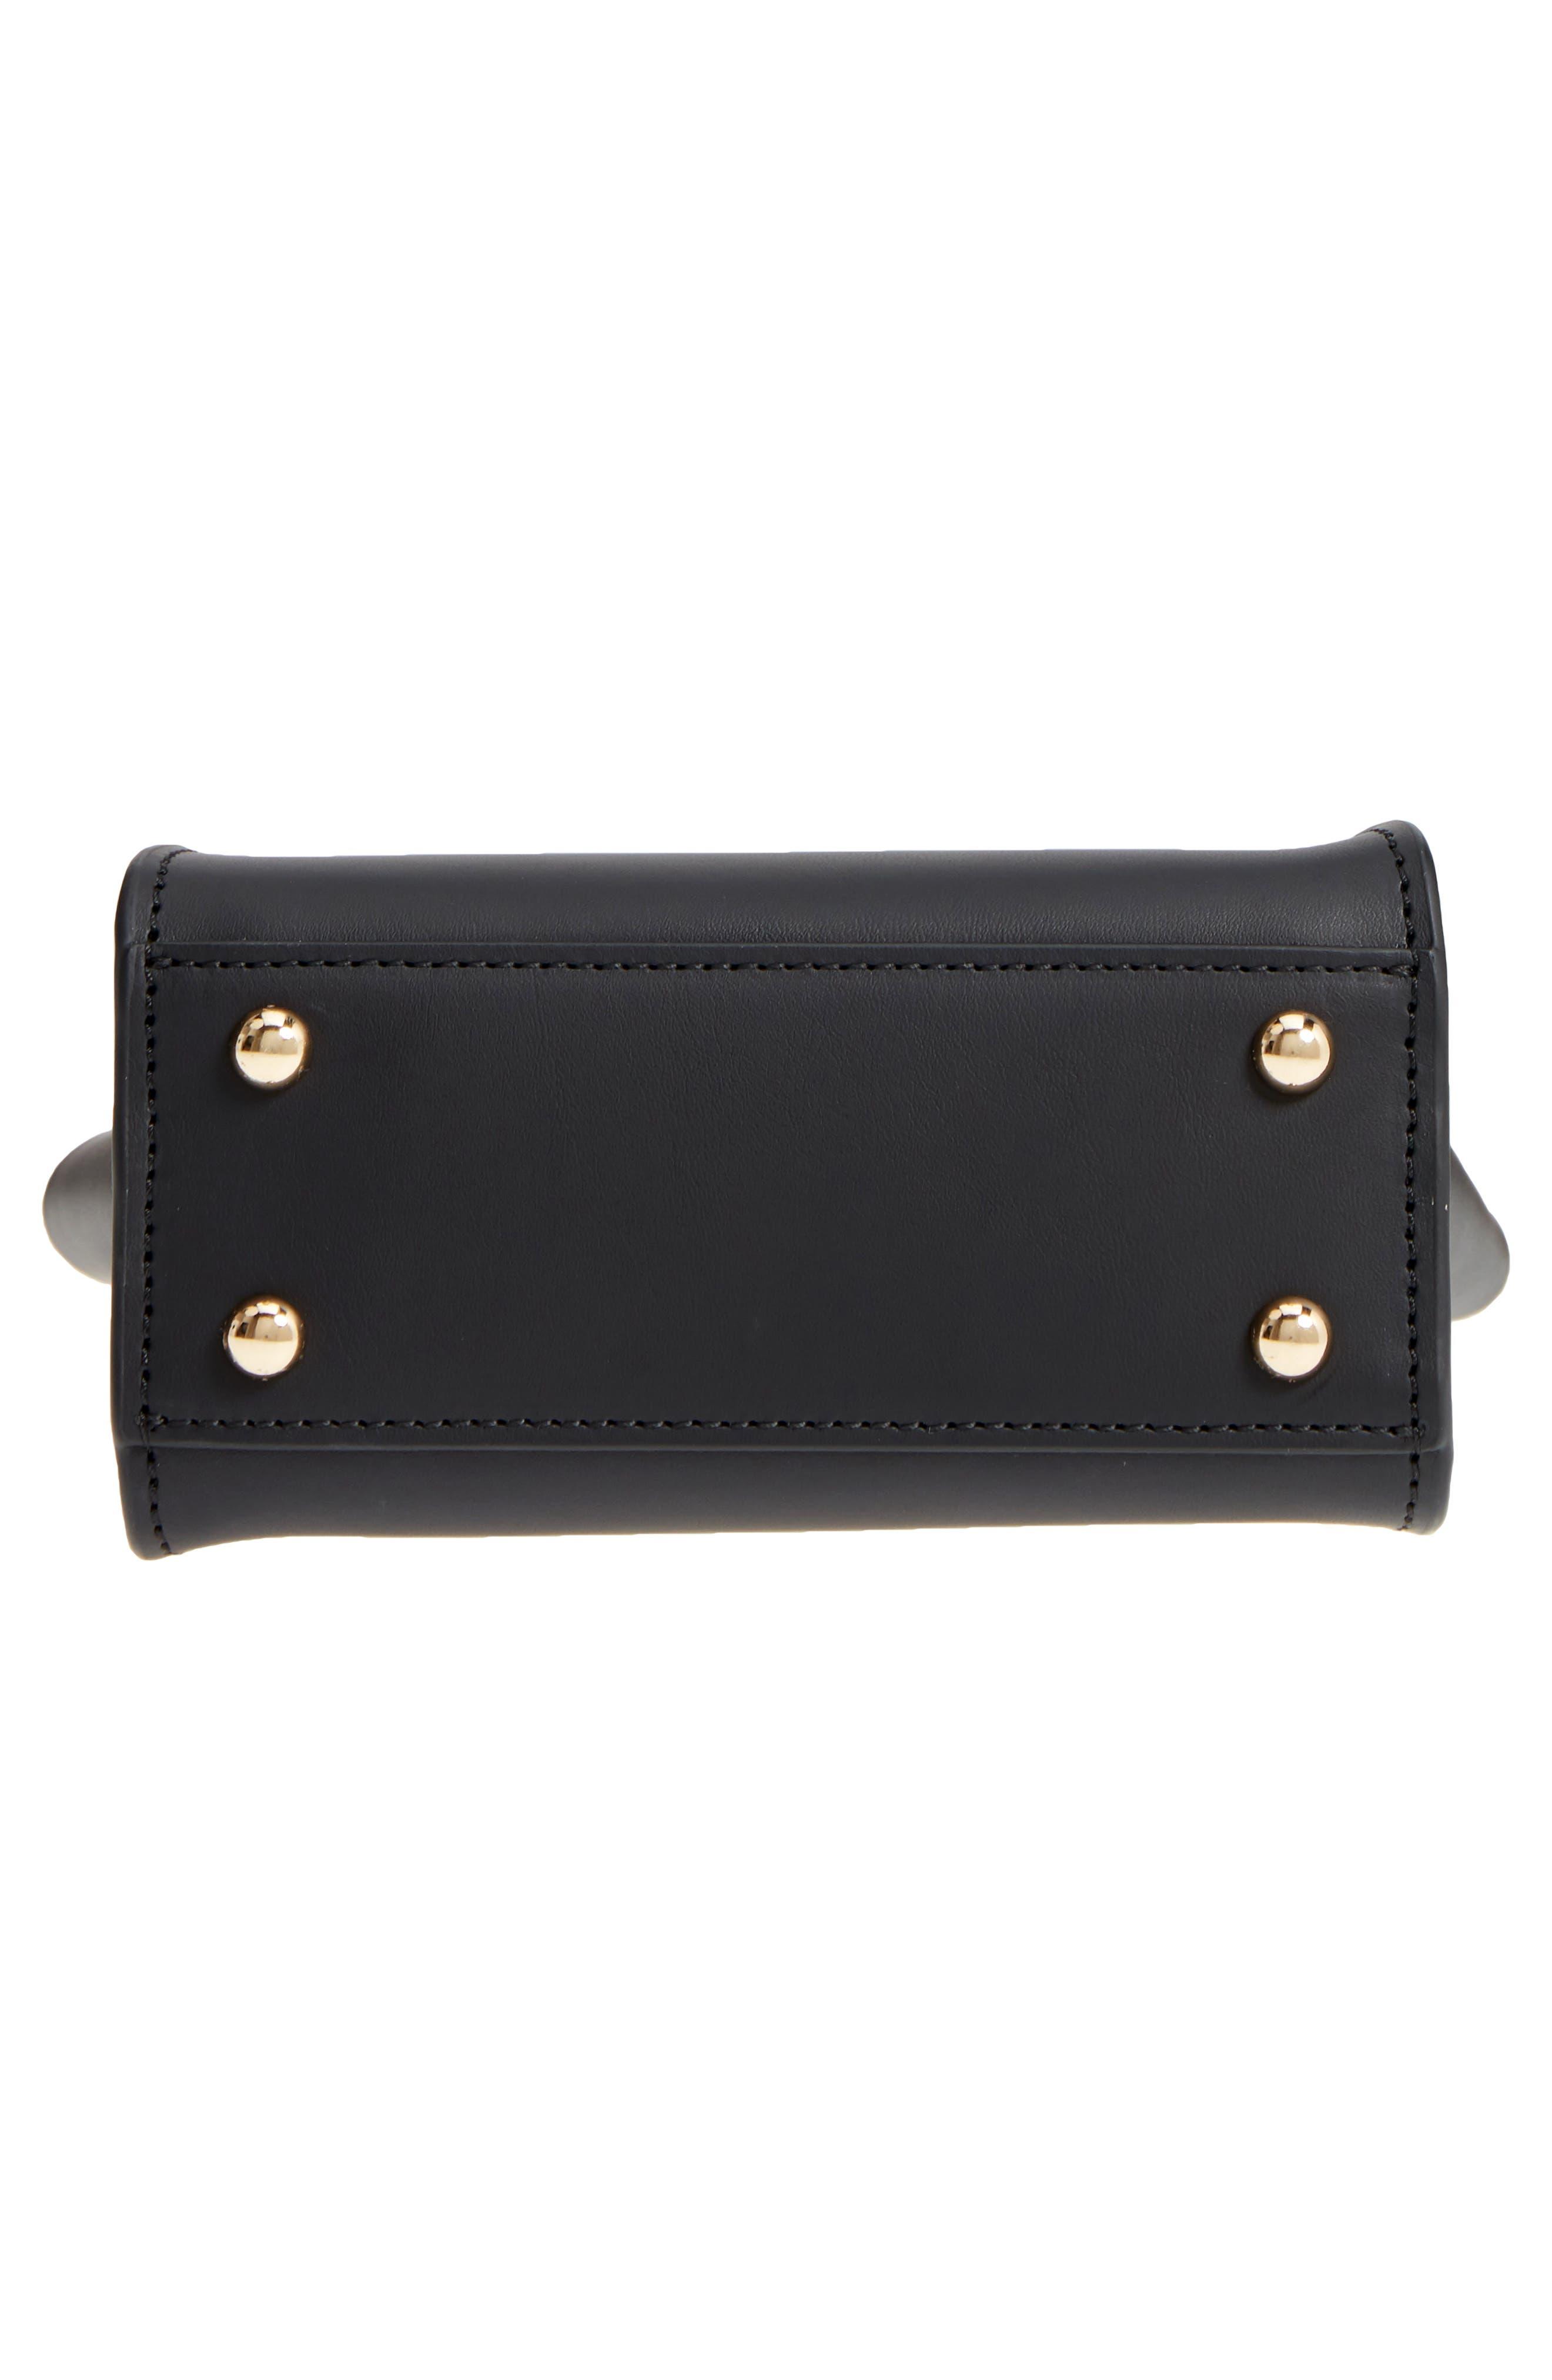 Mini Eartha Iconic Calfskin Leather Top Handle Satchel,                             Alternate thumbnail 6, color,                             Black